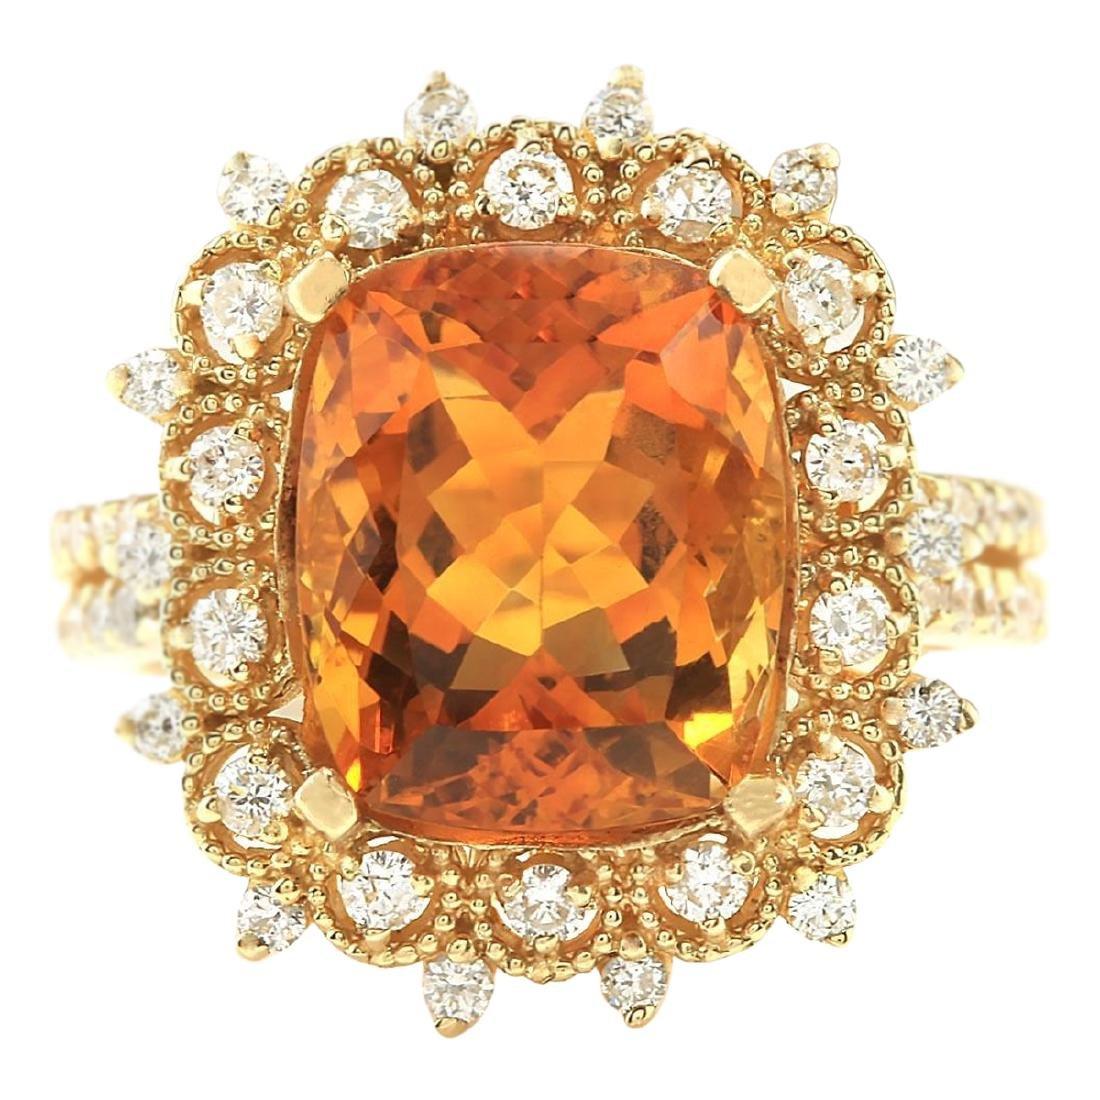 6.39 CTW Natural Madeira Citrine And Diamond Ring 18K